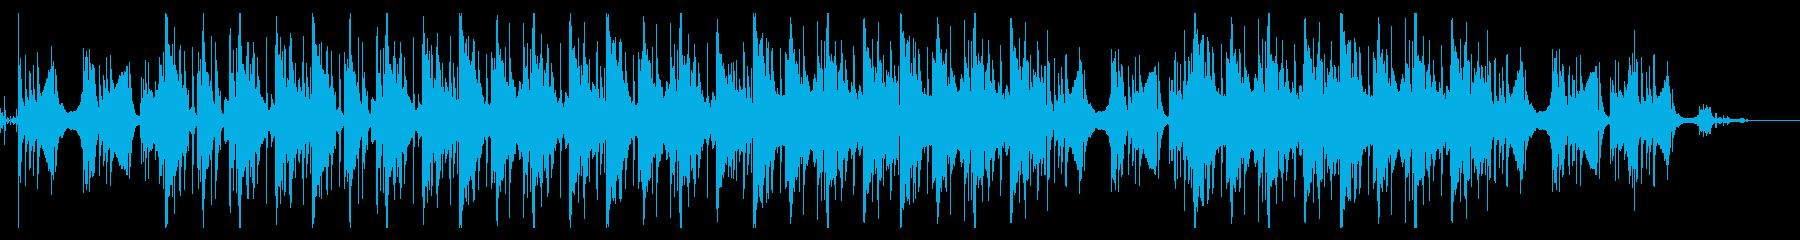 lofiなBGM vlogなどにの再生済みの波形